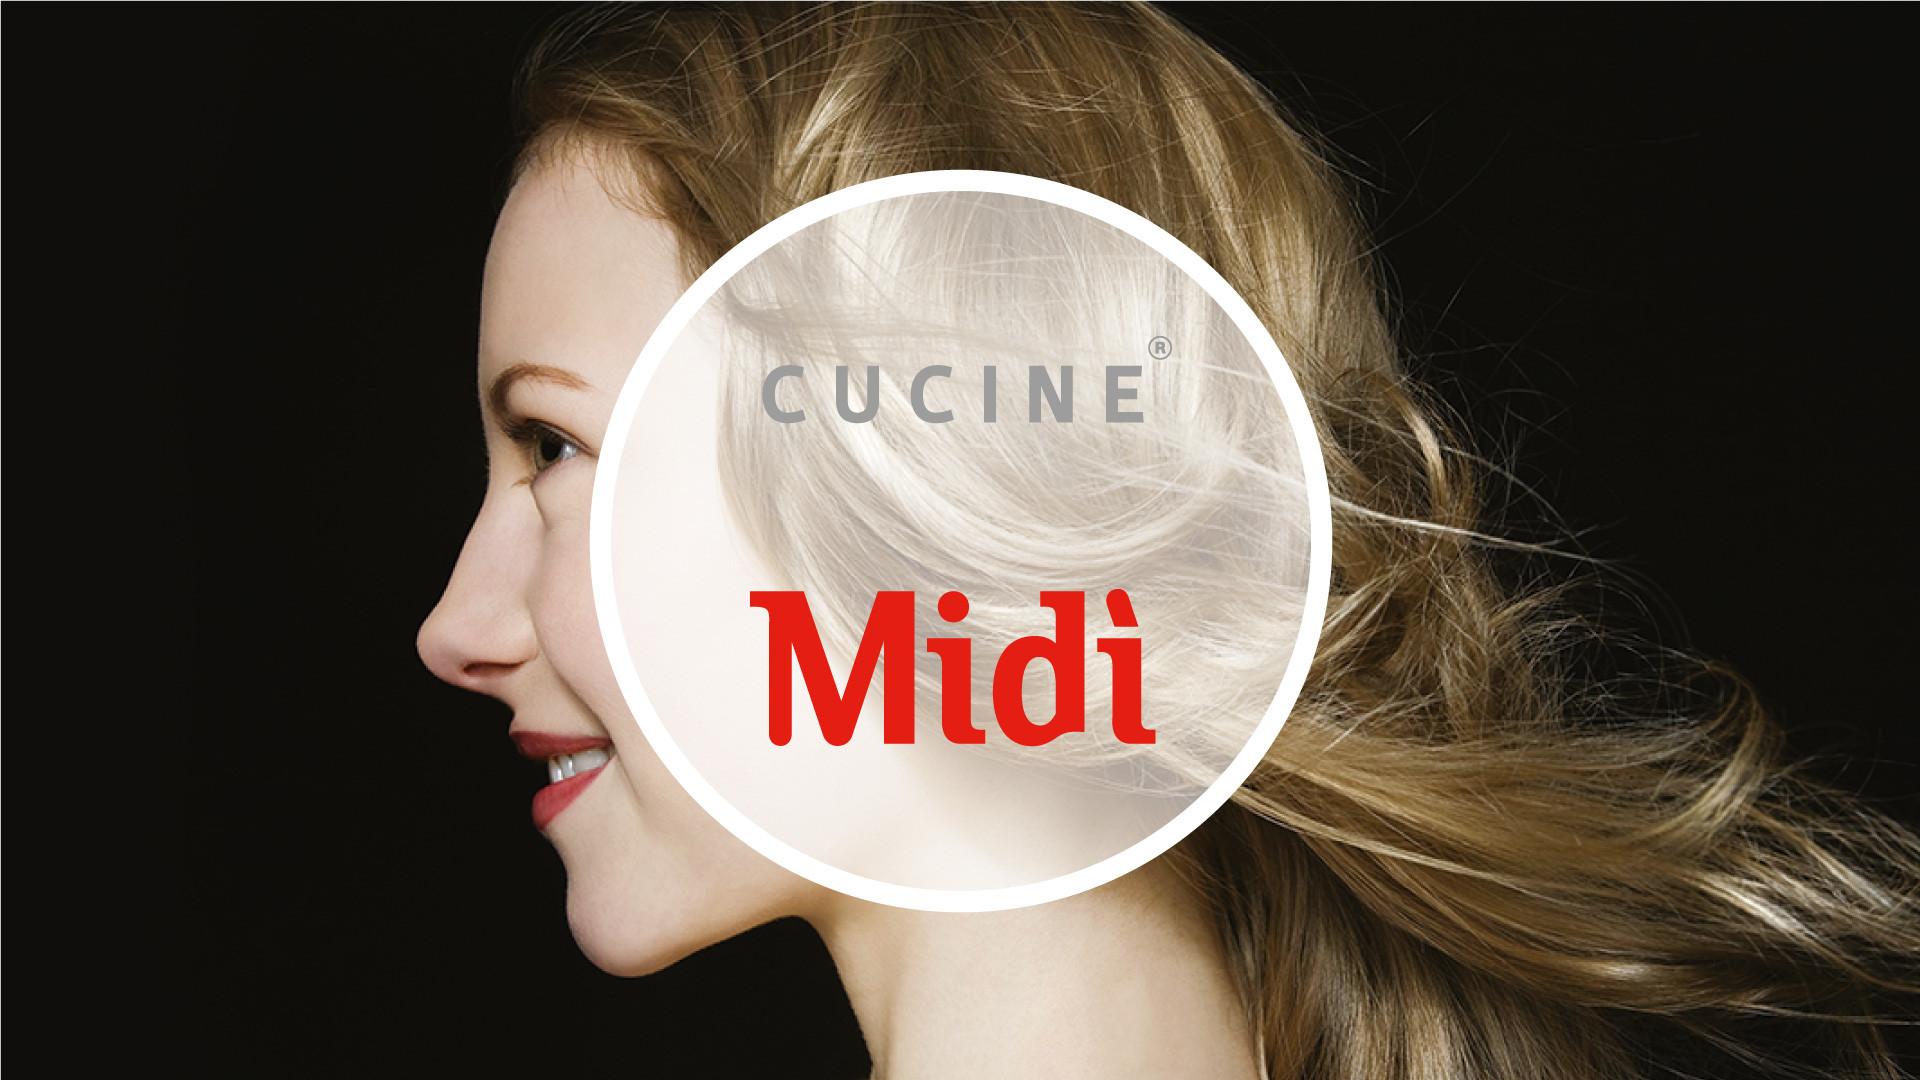 Cucine Midi Creativeintelligence